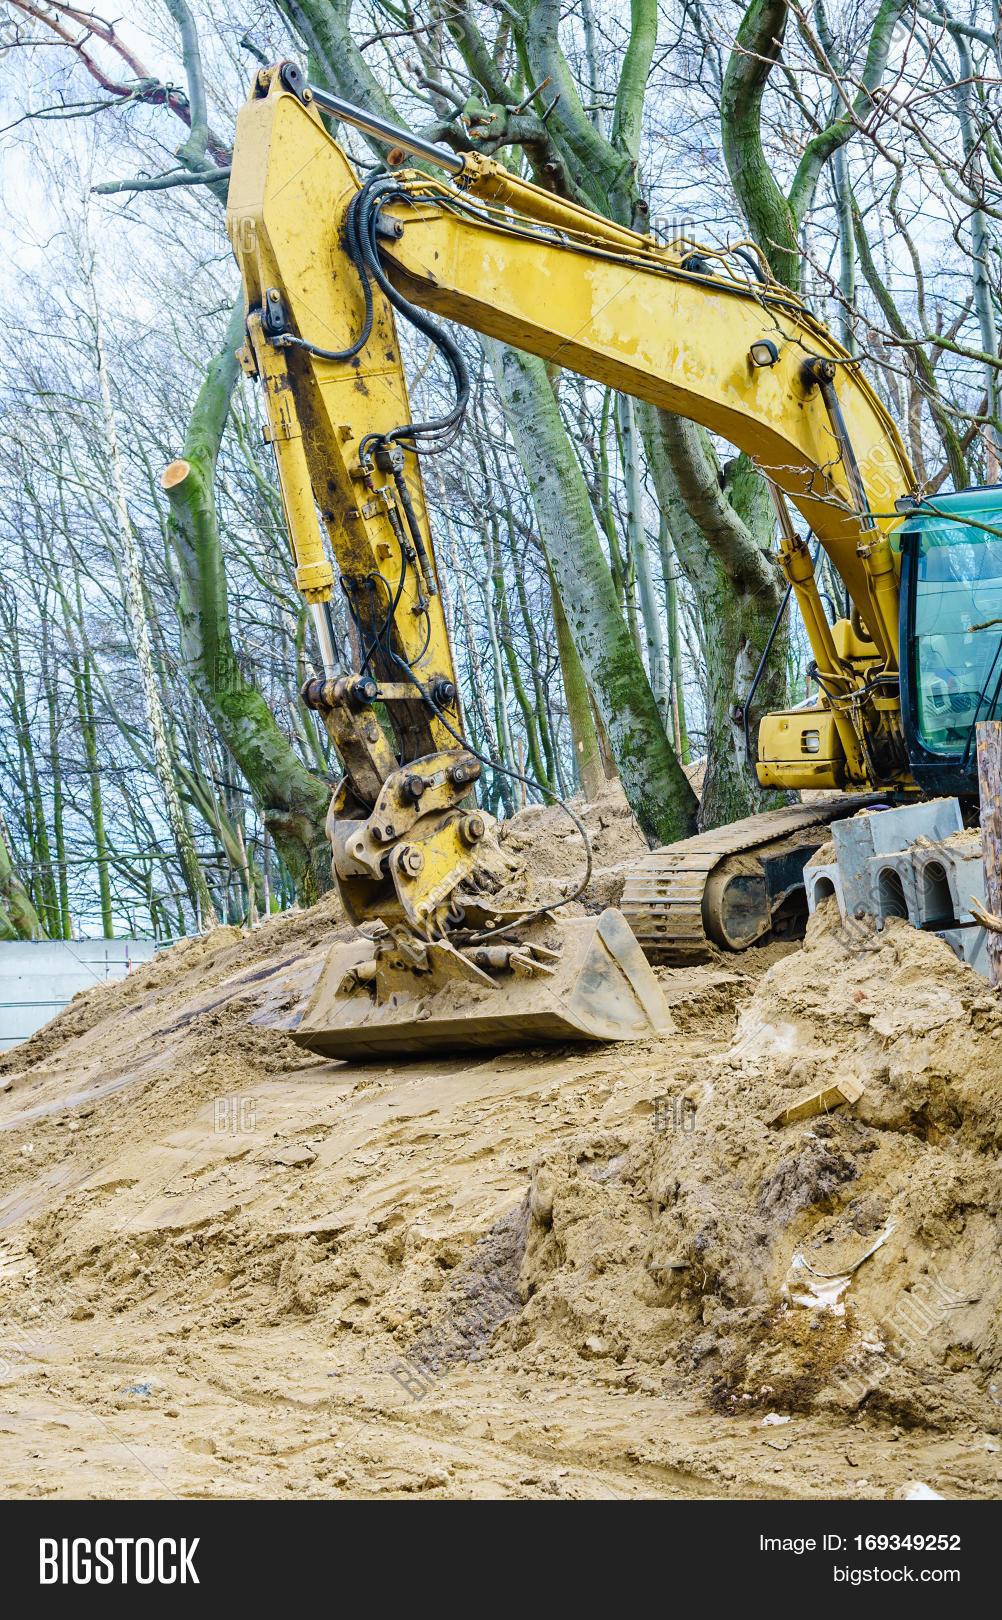 Yellow Excavator Dig Image & Photo (Free Trial)   Bigstock